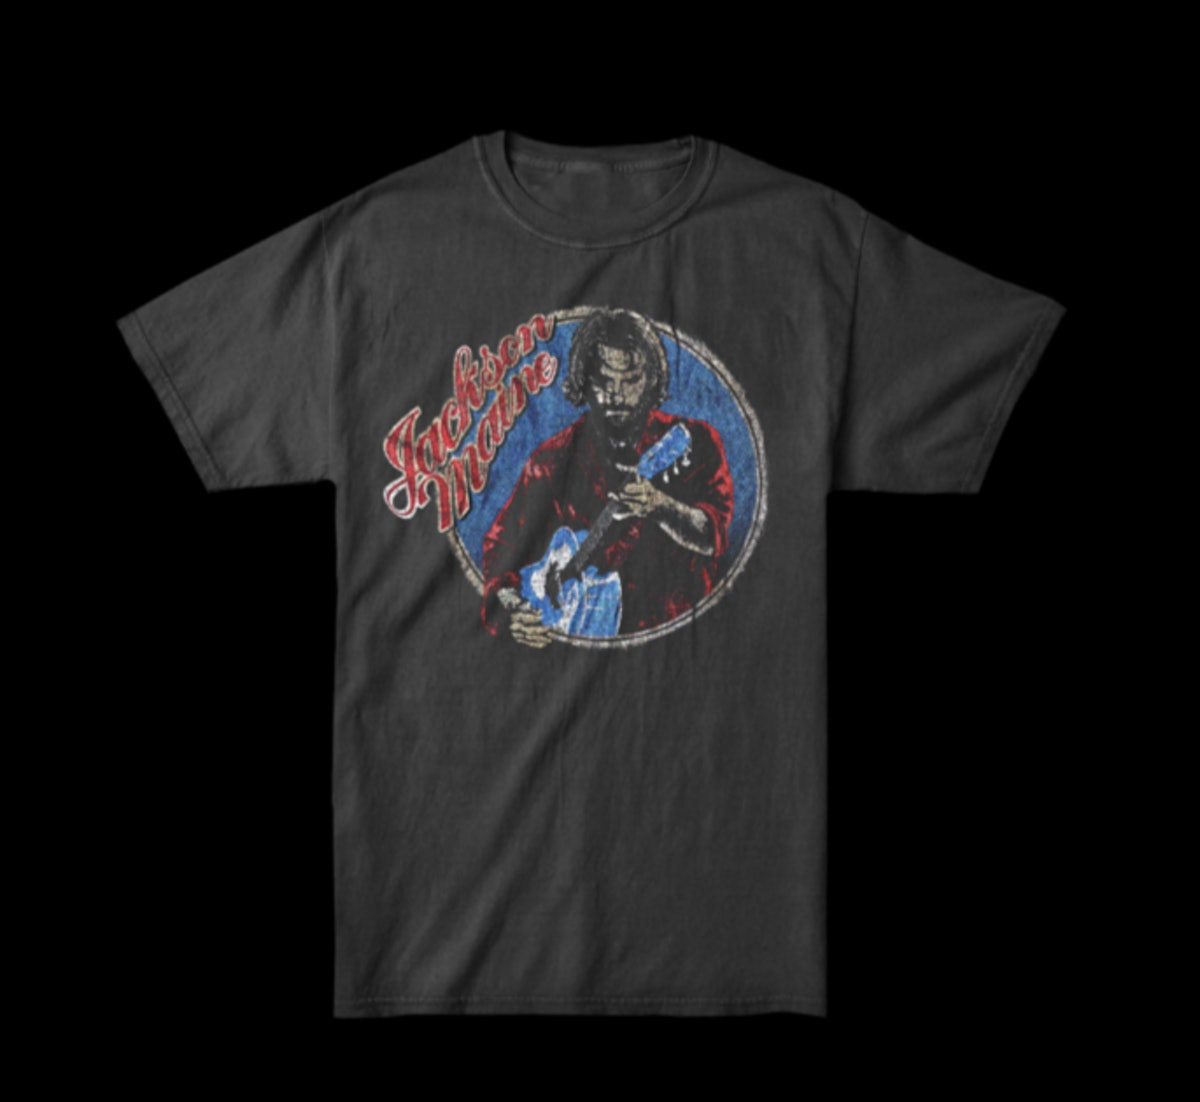 Jackson T-shirt + Digital Album